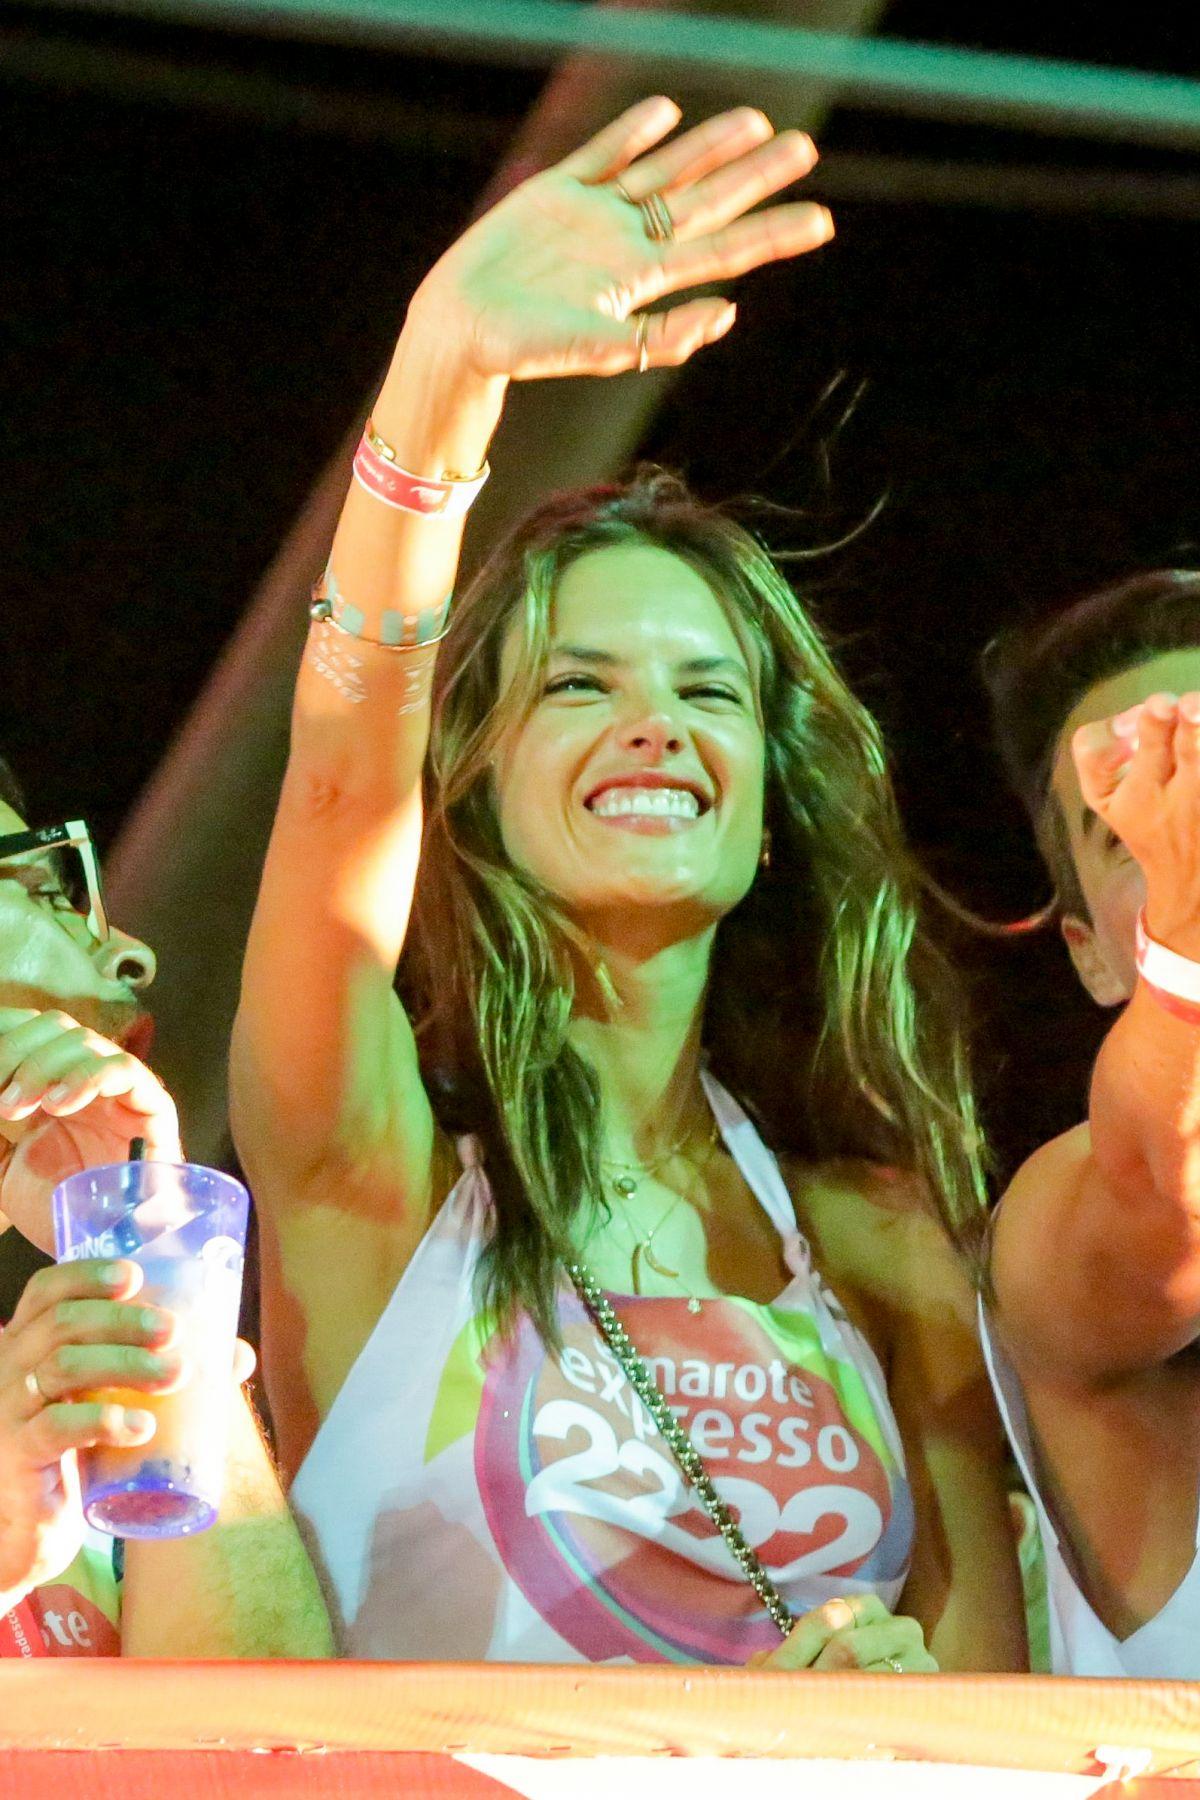 ALESSANDRA AMBROSIO at Carnival in Brazil